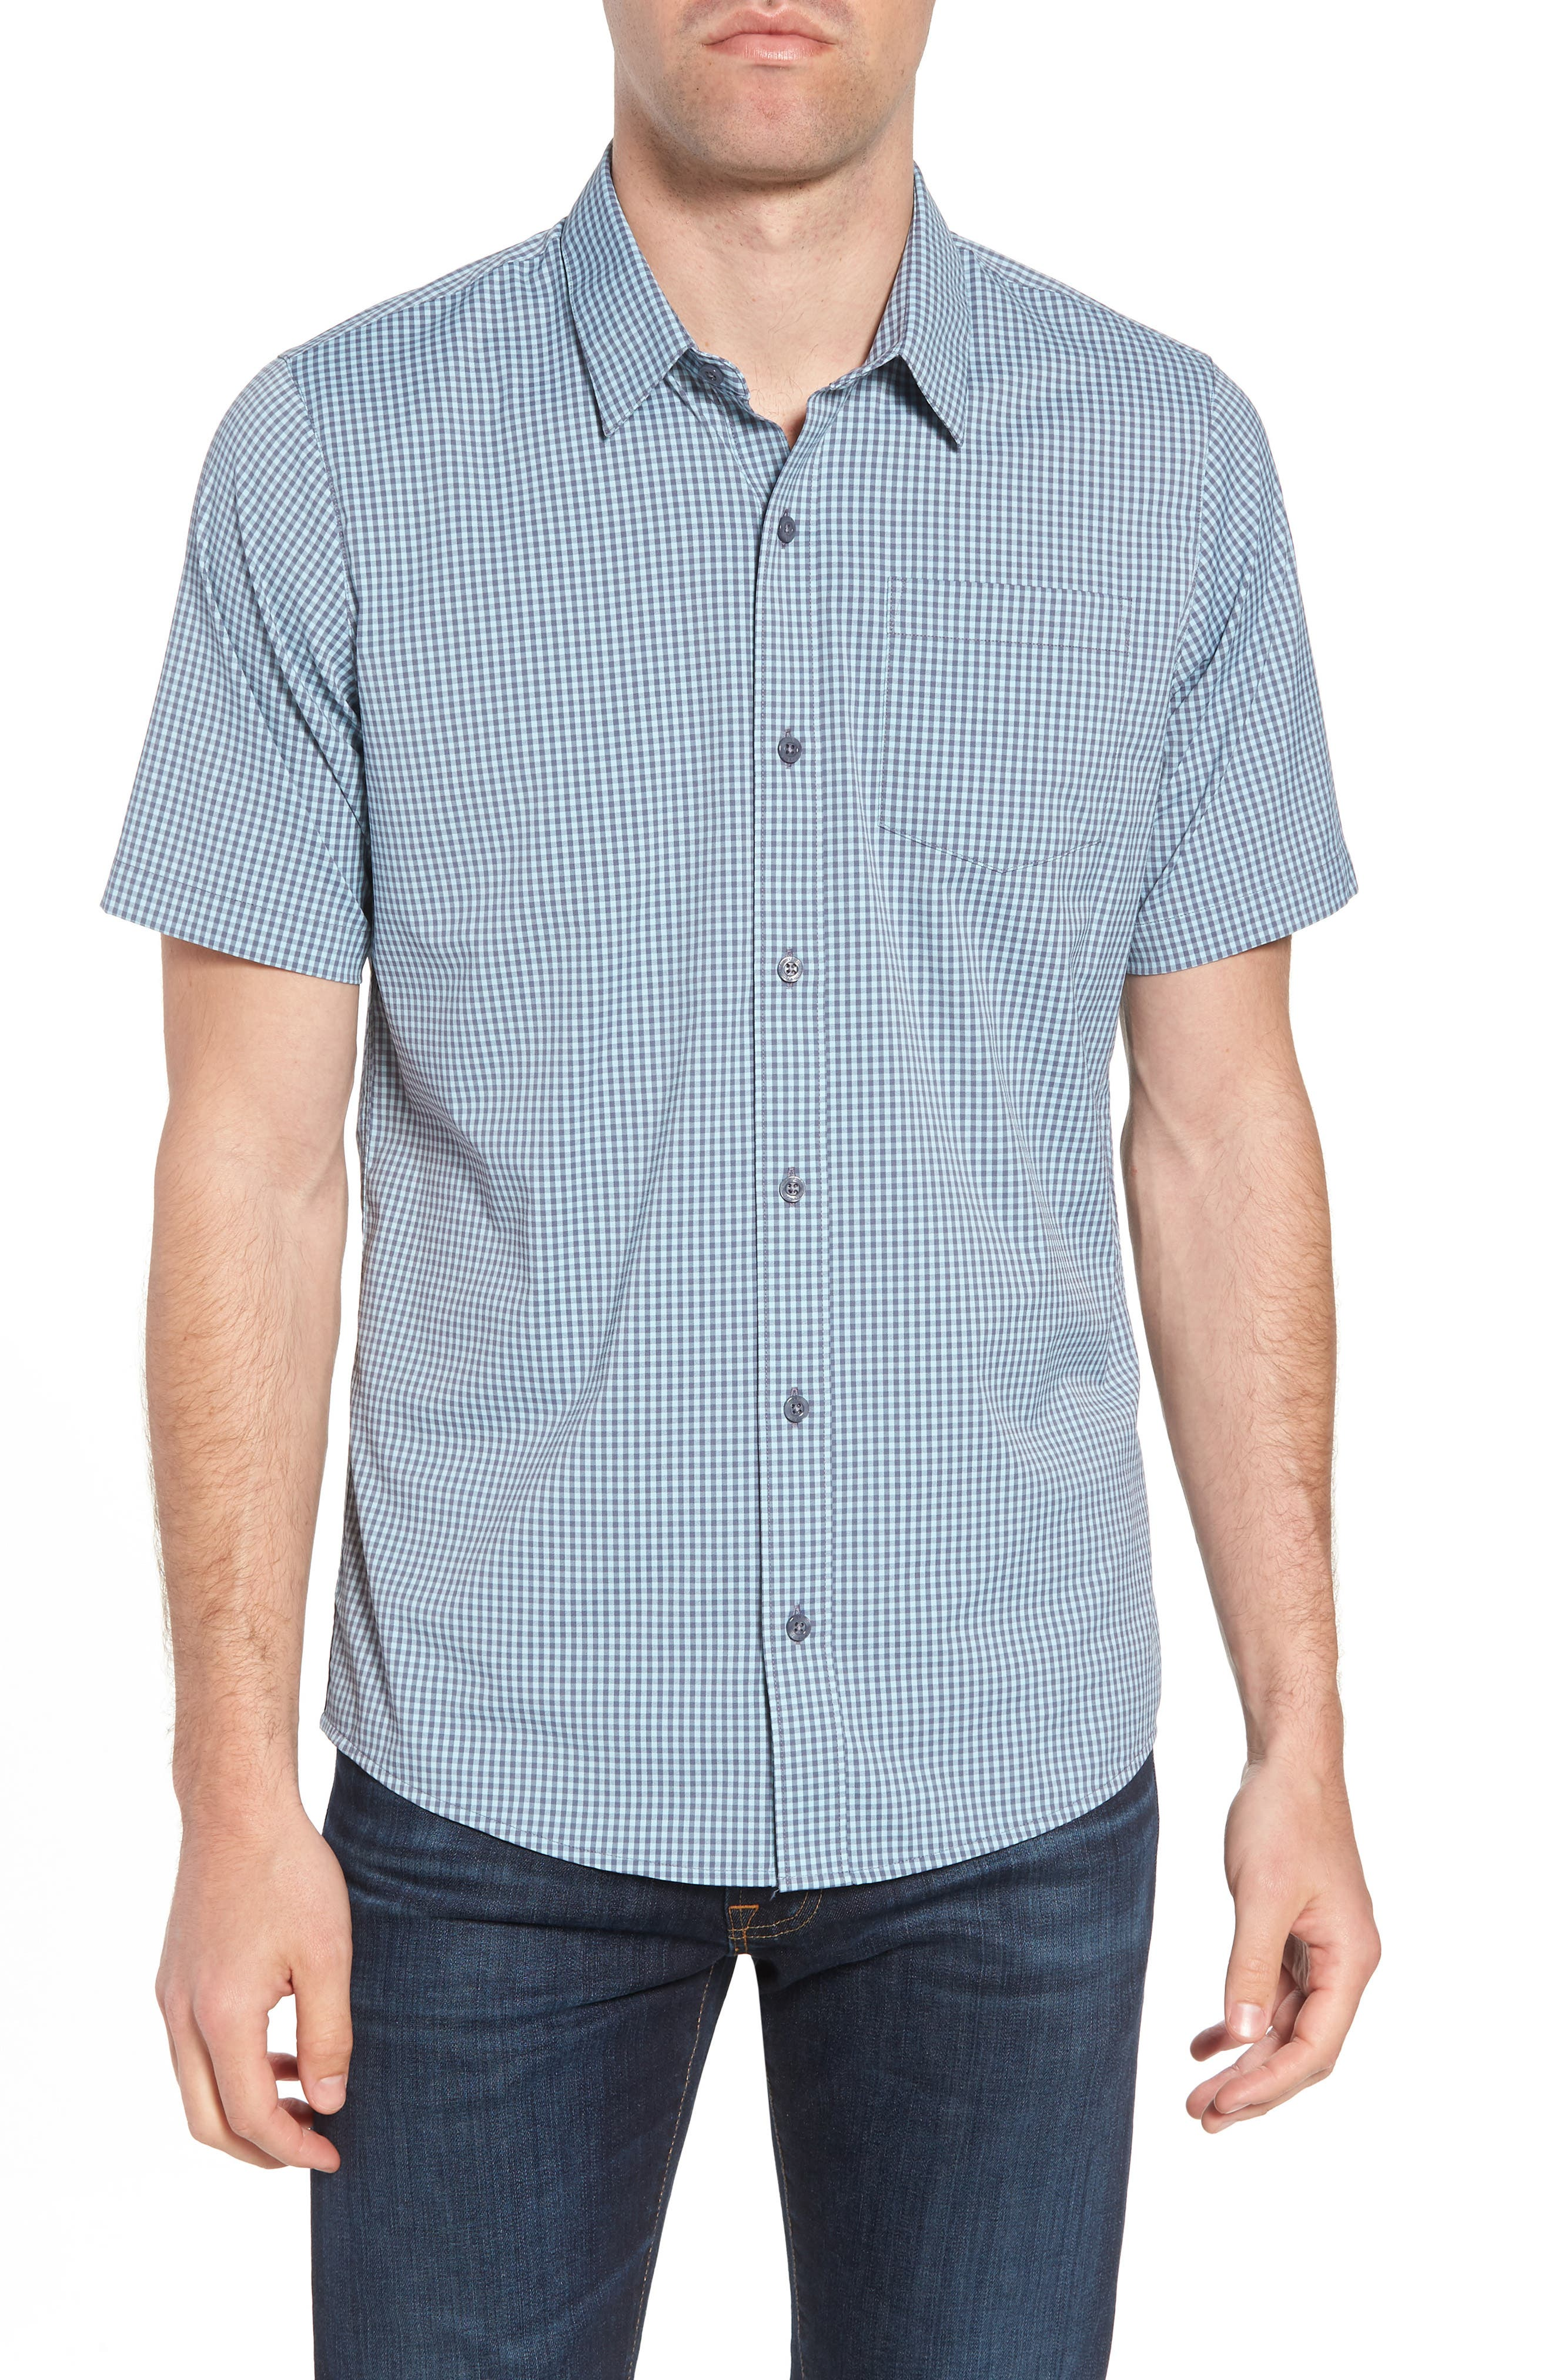 Gygax Regular Fit Sport Shirt,                             Main thumbnail 1, color,                             Porcelain Blue